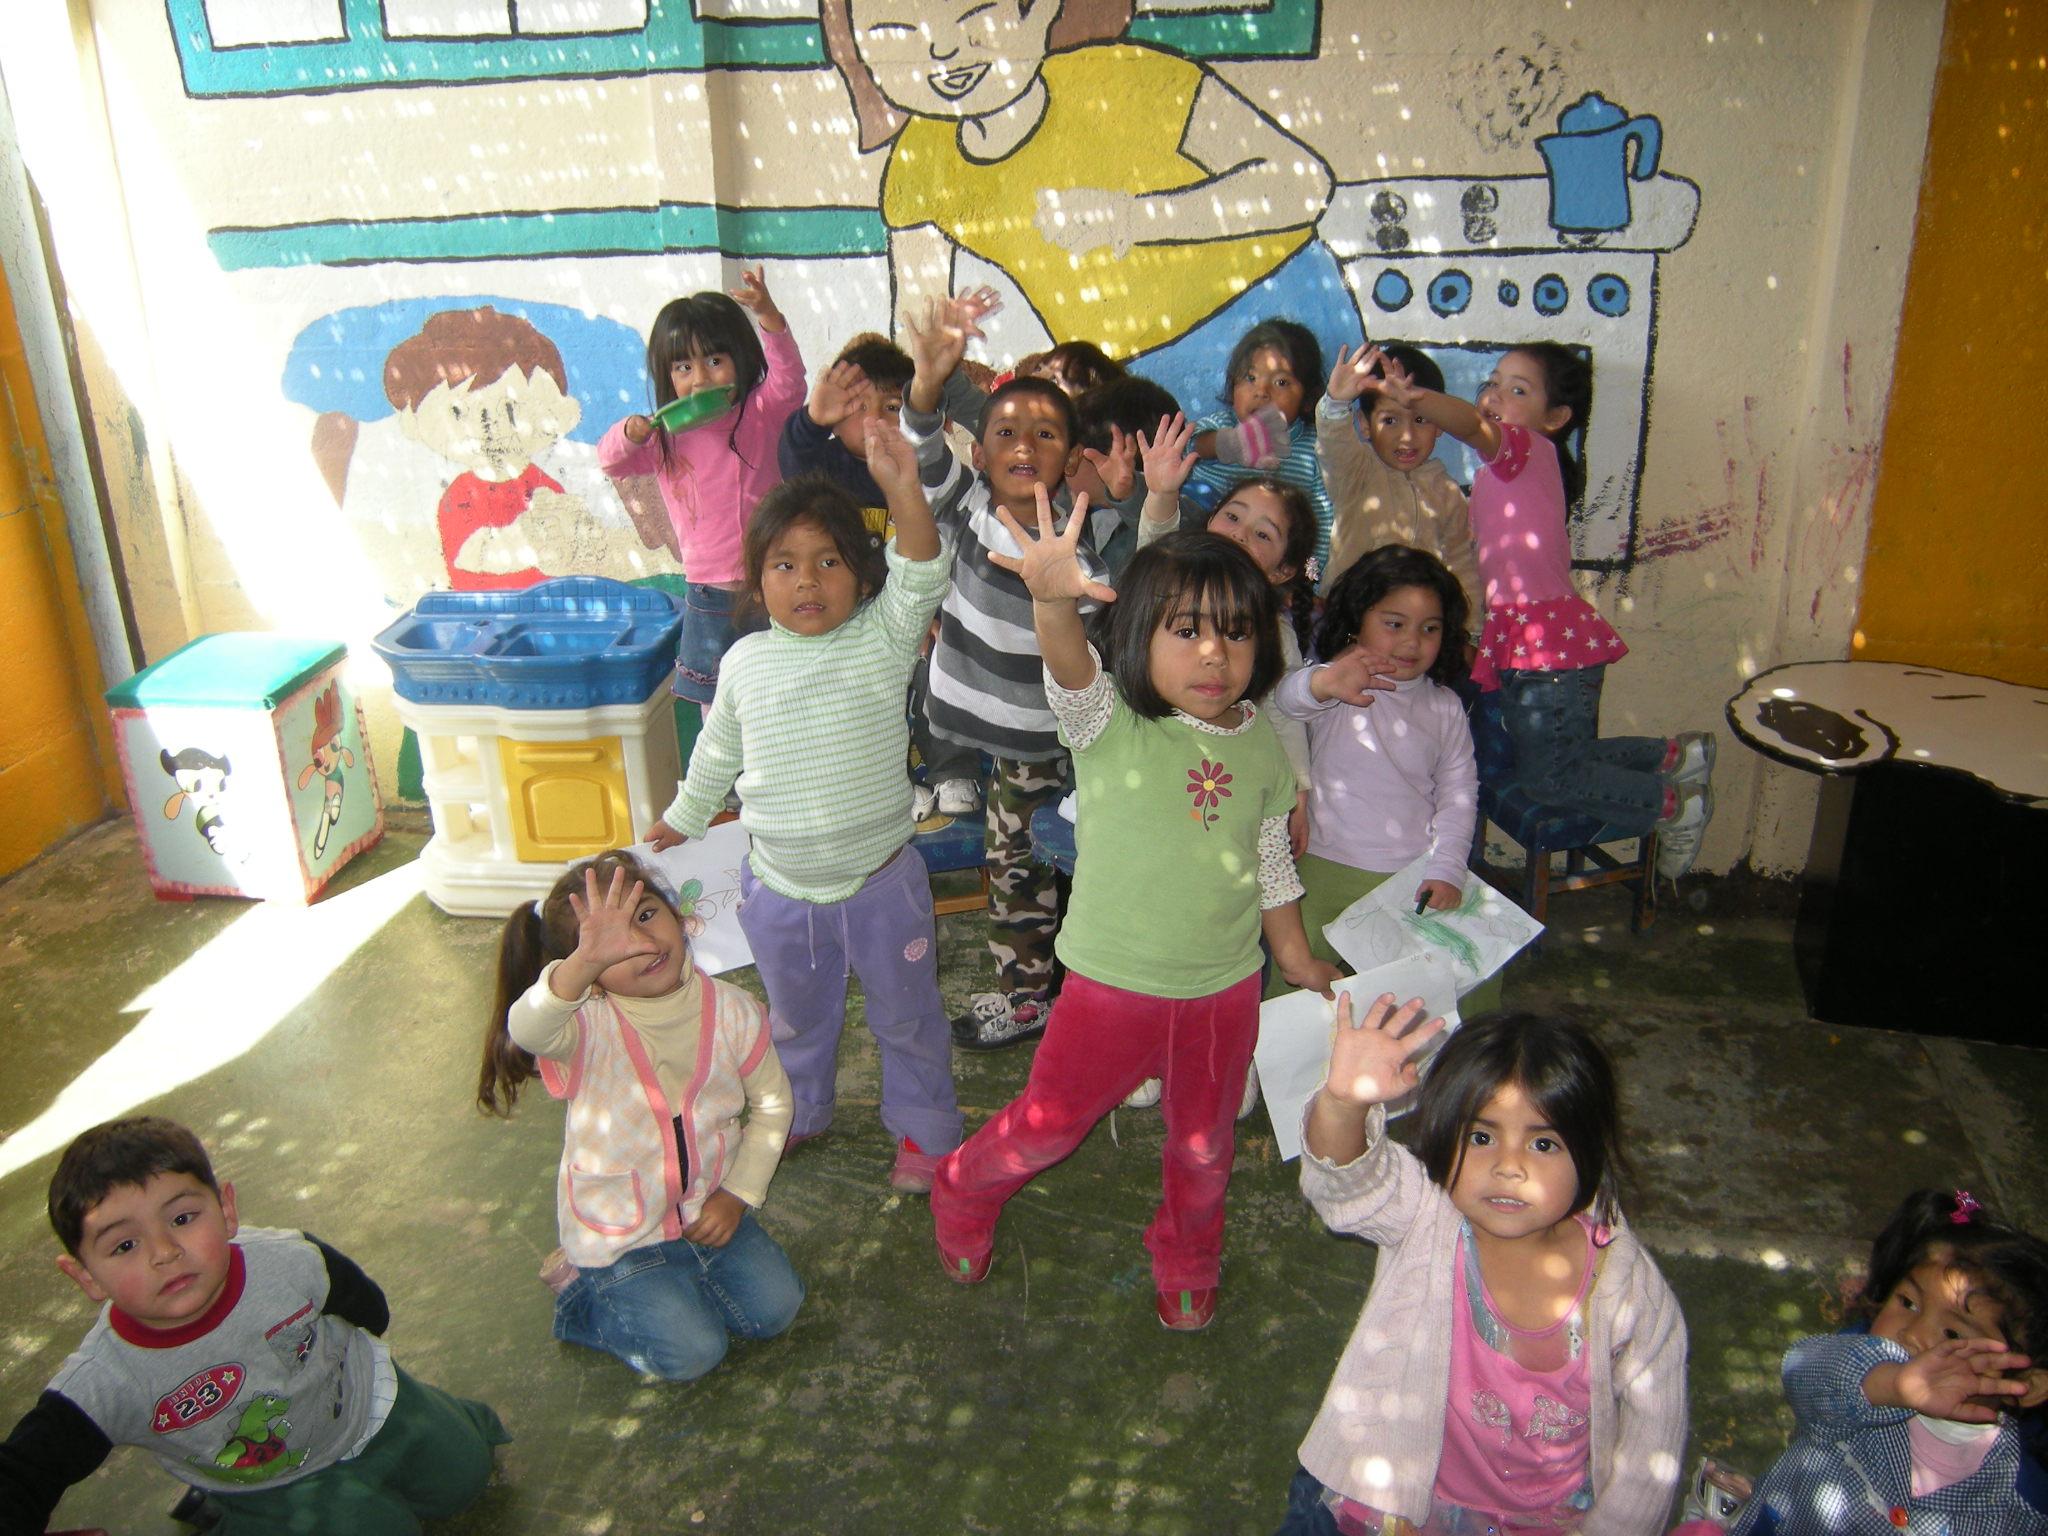 Integra renueva material en jardines infantiles http for Jardin villa austral punta arenas